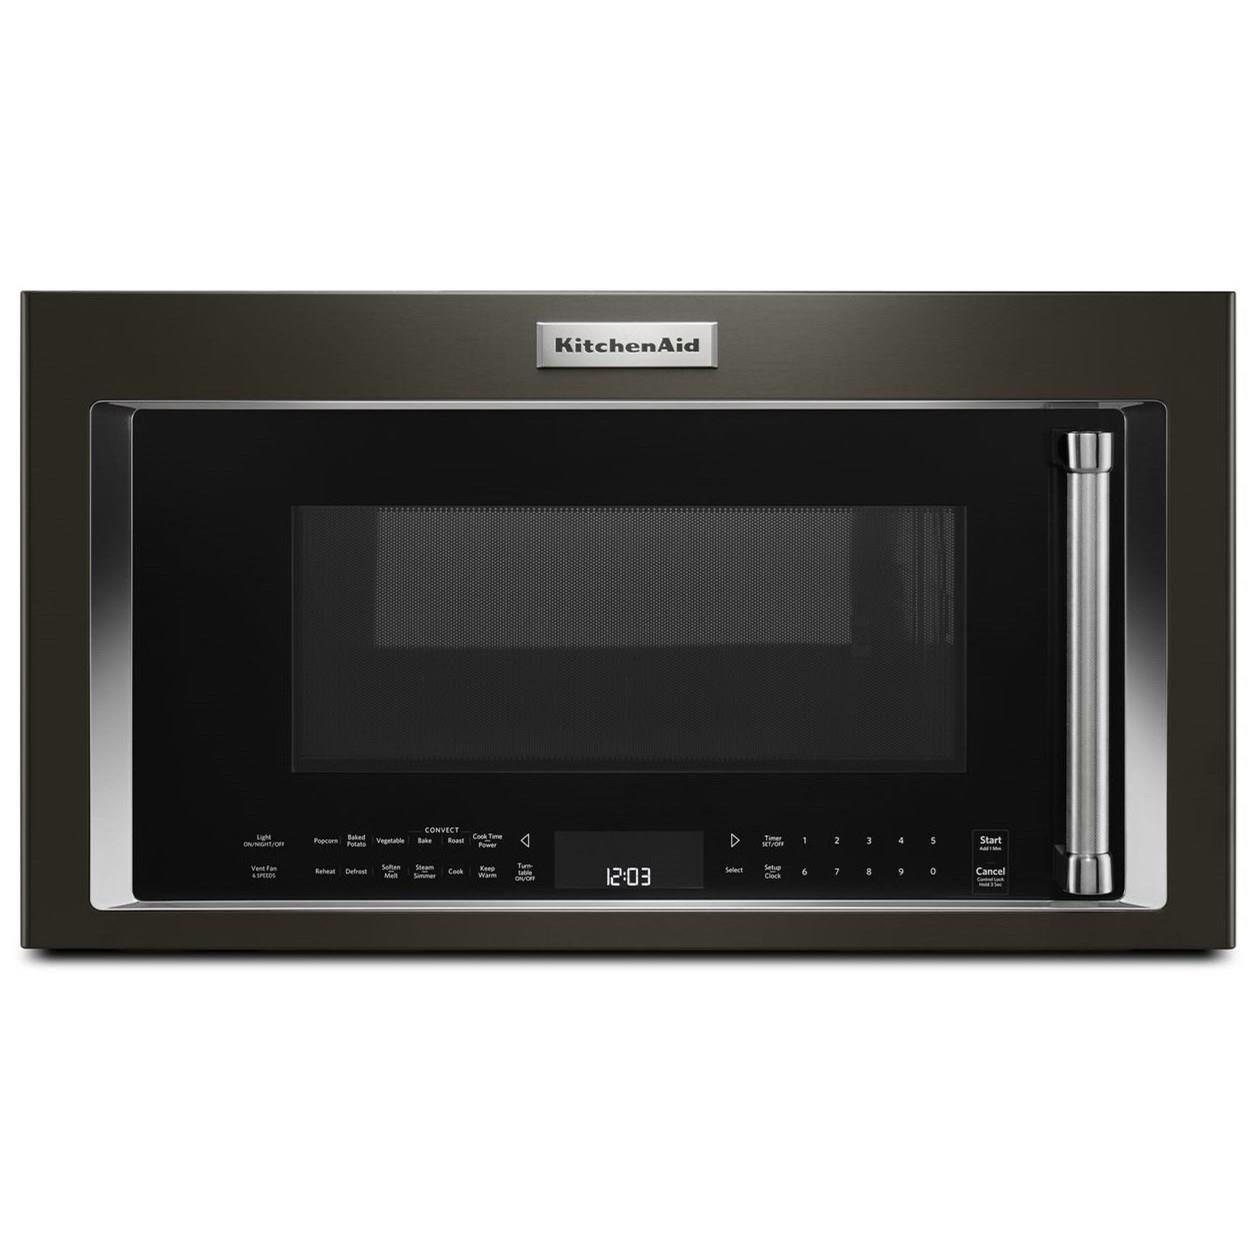 kitchen aid microwaves average size of sink kitchenaid kmhc319ebs1 9 cu ft 1000 watt convection